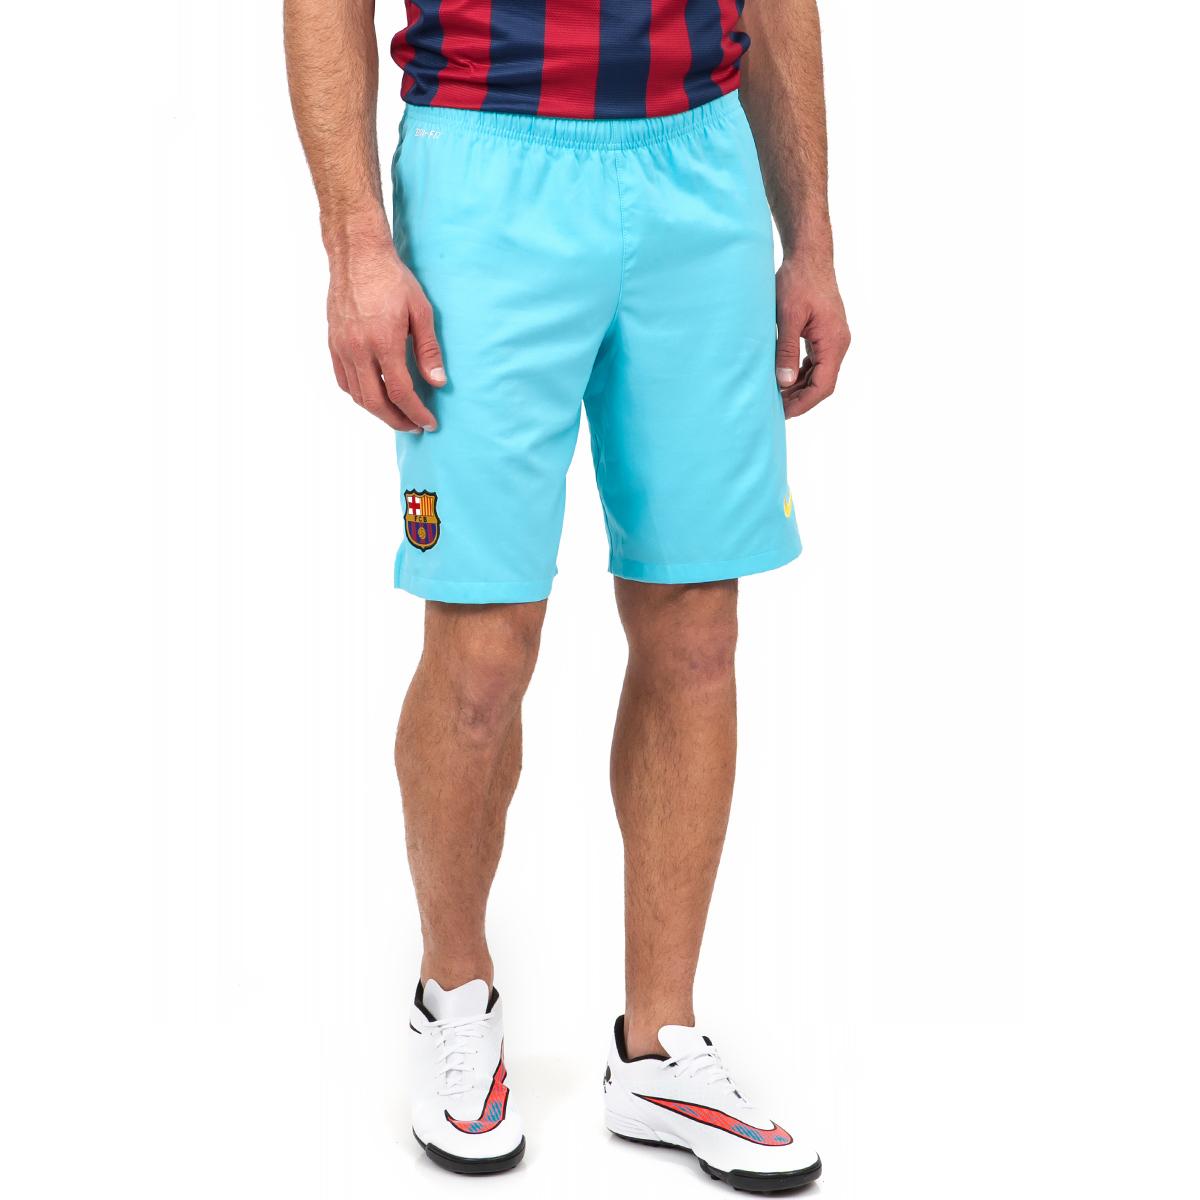 NIKE - Ανδρικό σορτς Nike Barcelona FC μπλε ανδρικά ρούχα σορτς βερμούδες αθλητικά